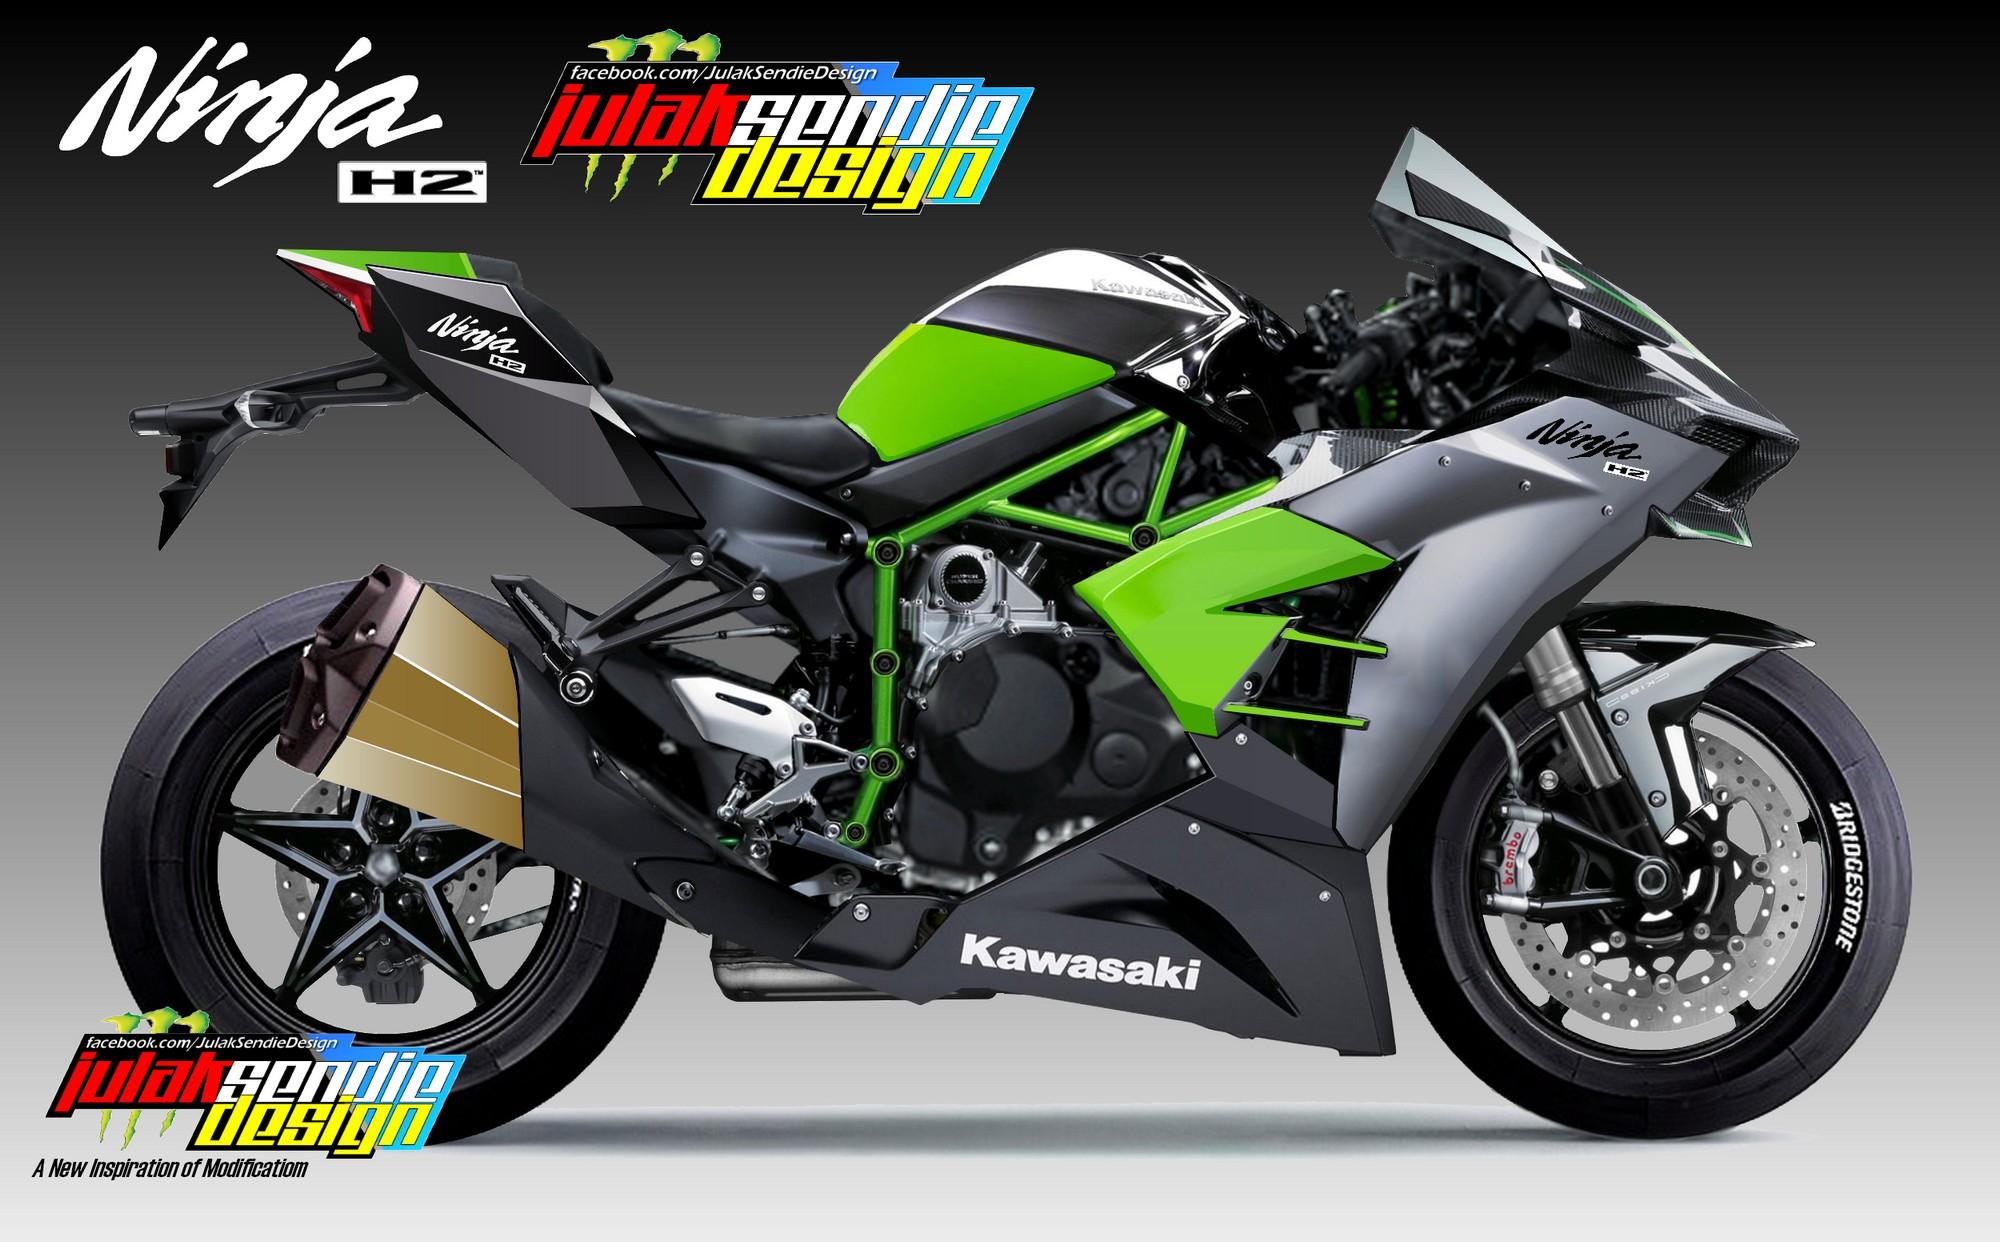 99 Gambar Motor Kawasaki Ninja H2 Terlengkap Gubuk Modifikasi